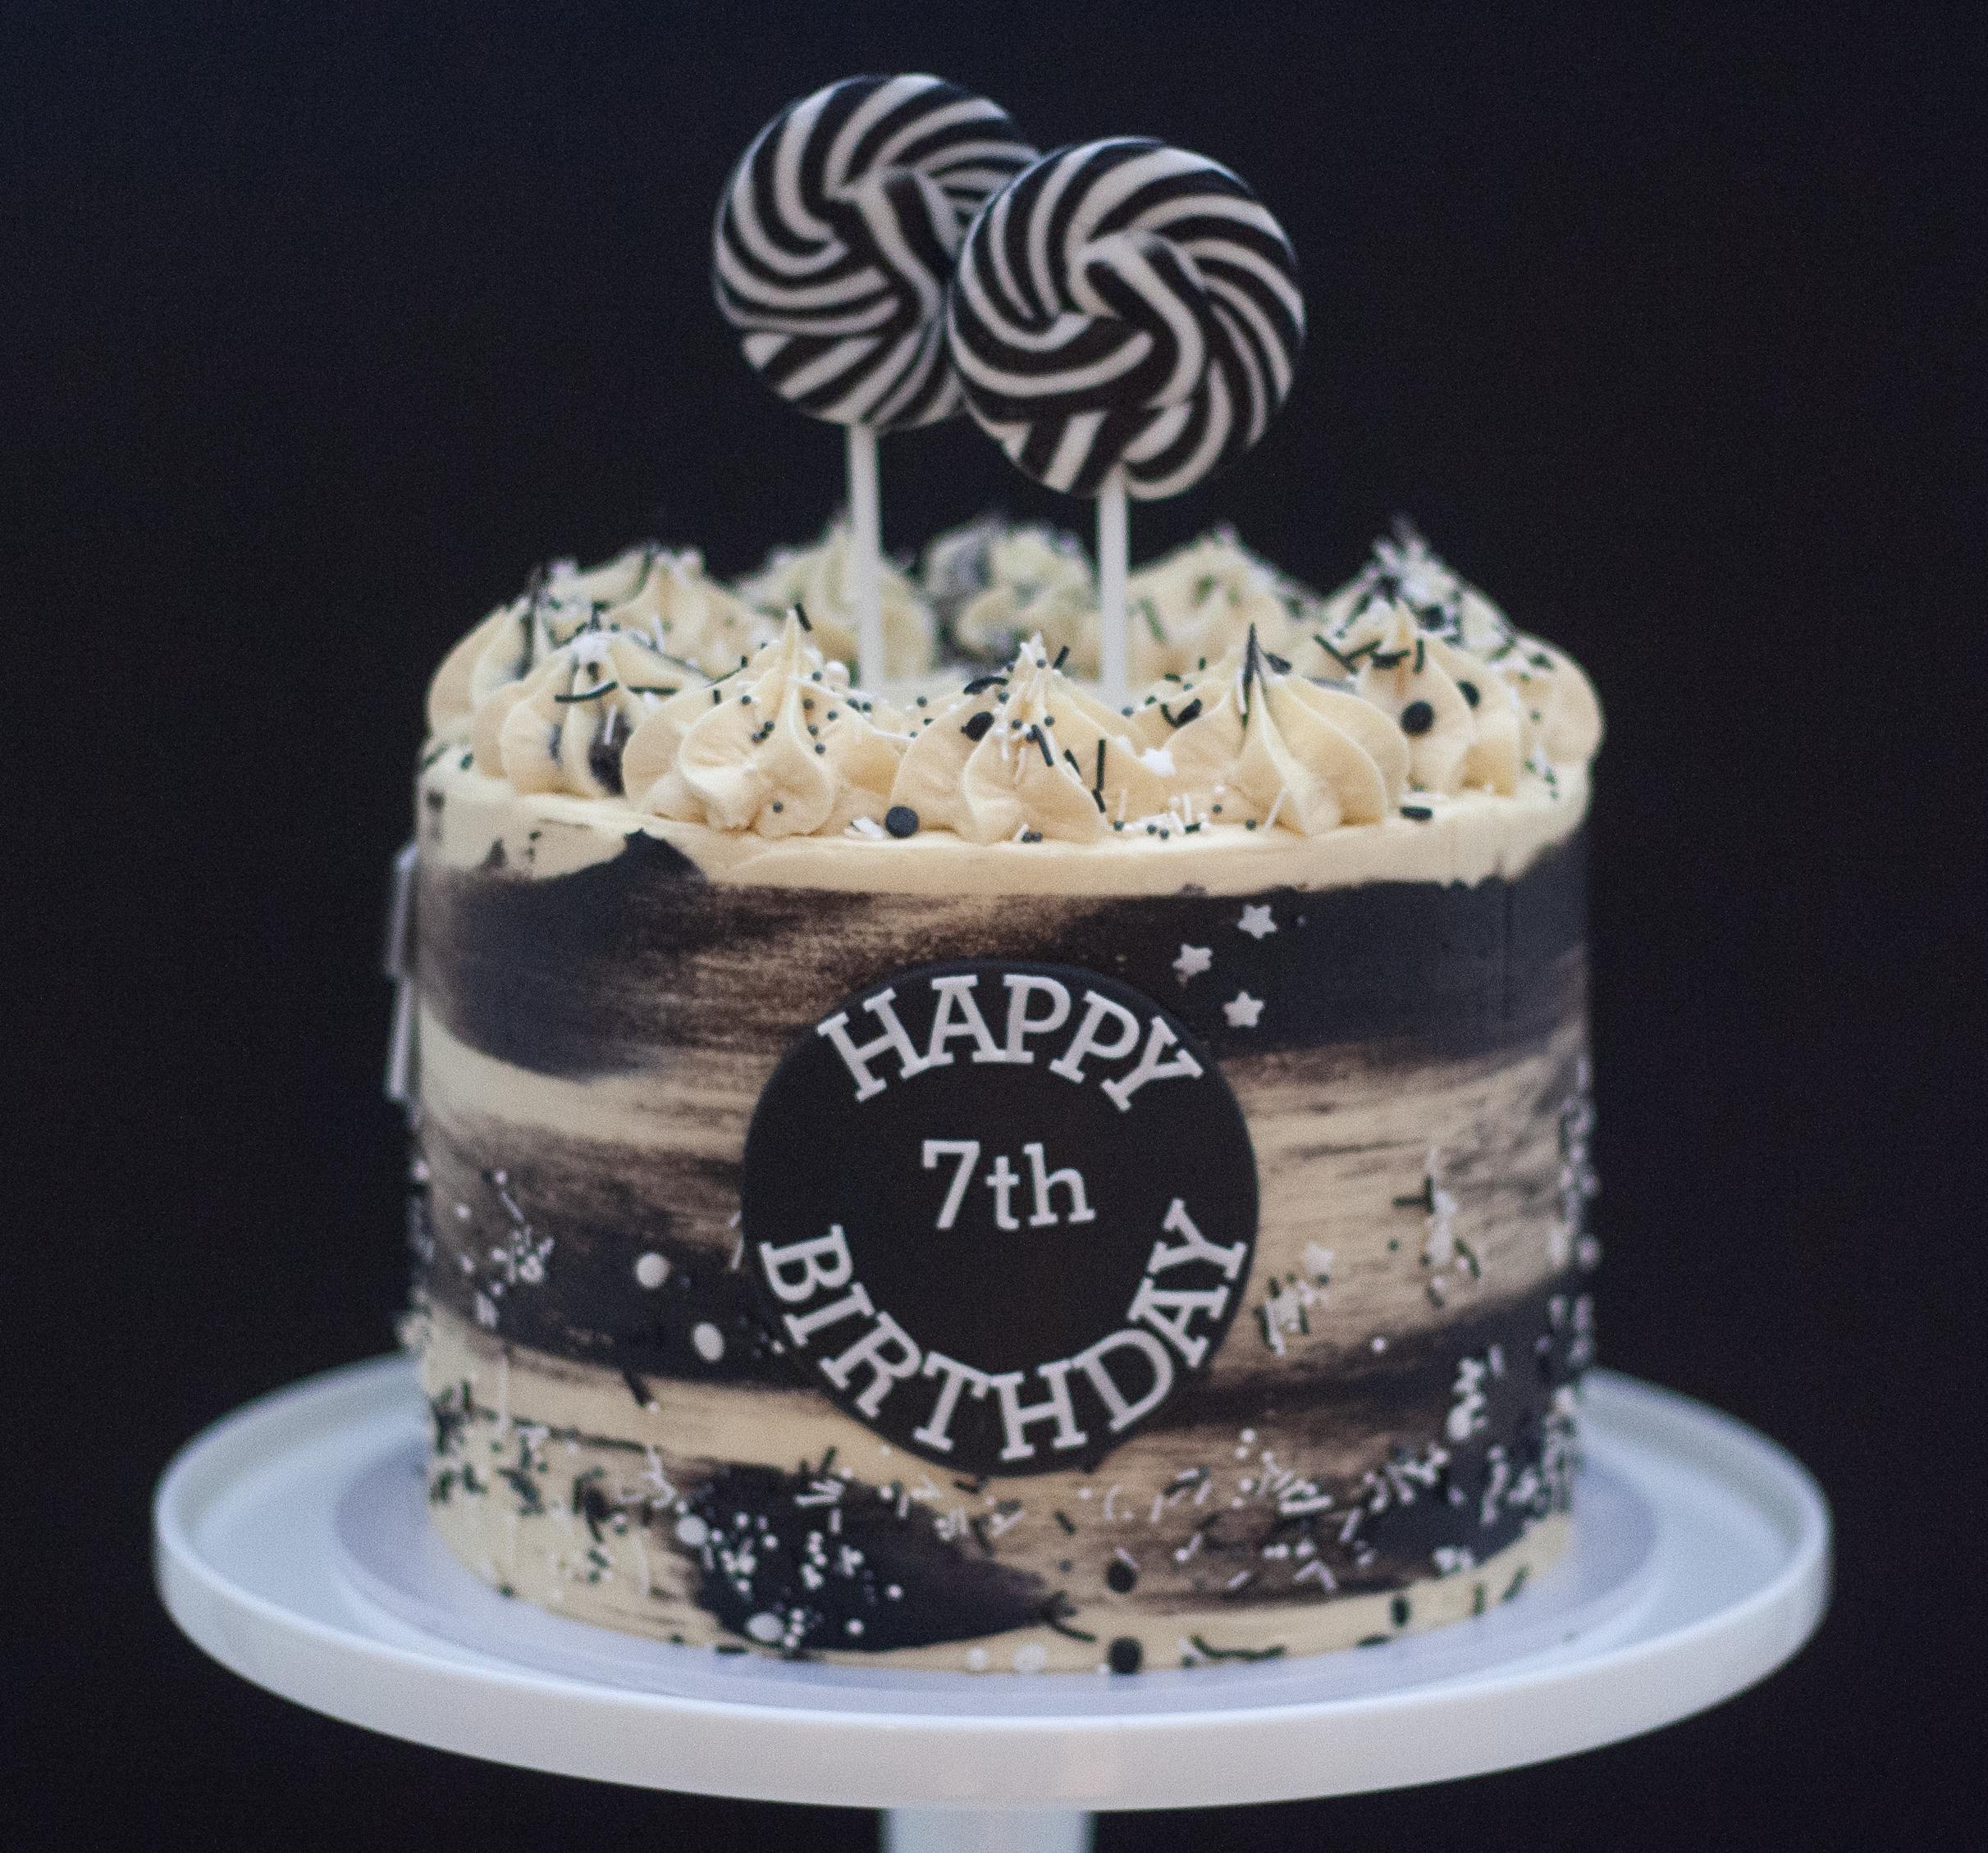 NUFC black marbled cake